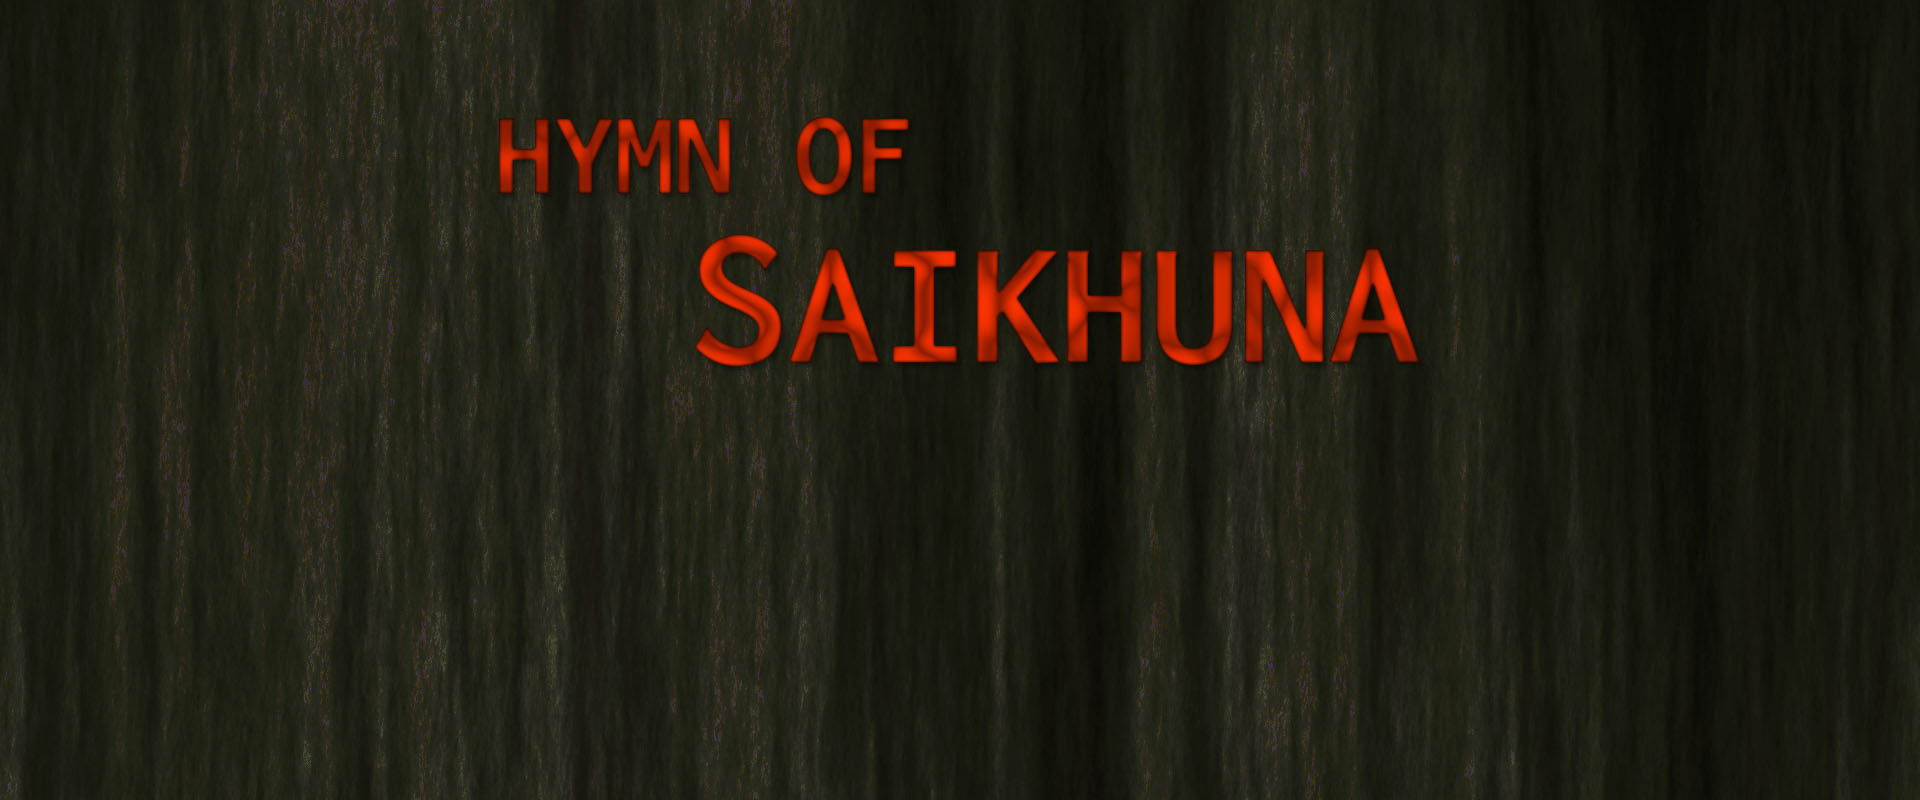 Hymn of Saikhuna – Analisi post mortem